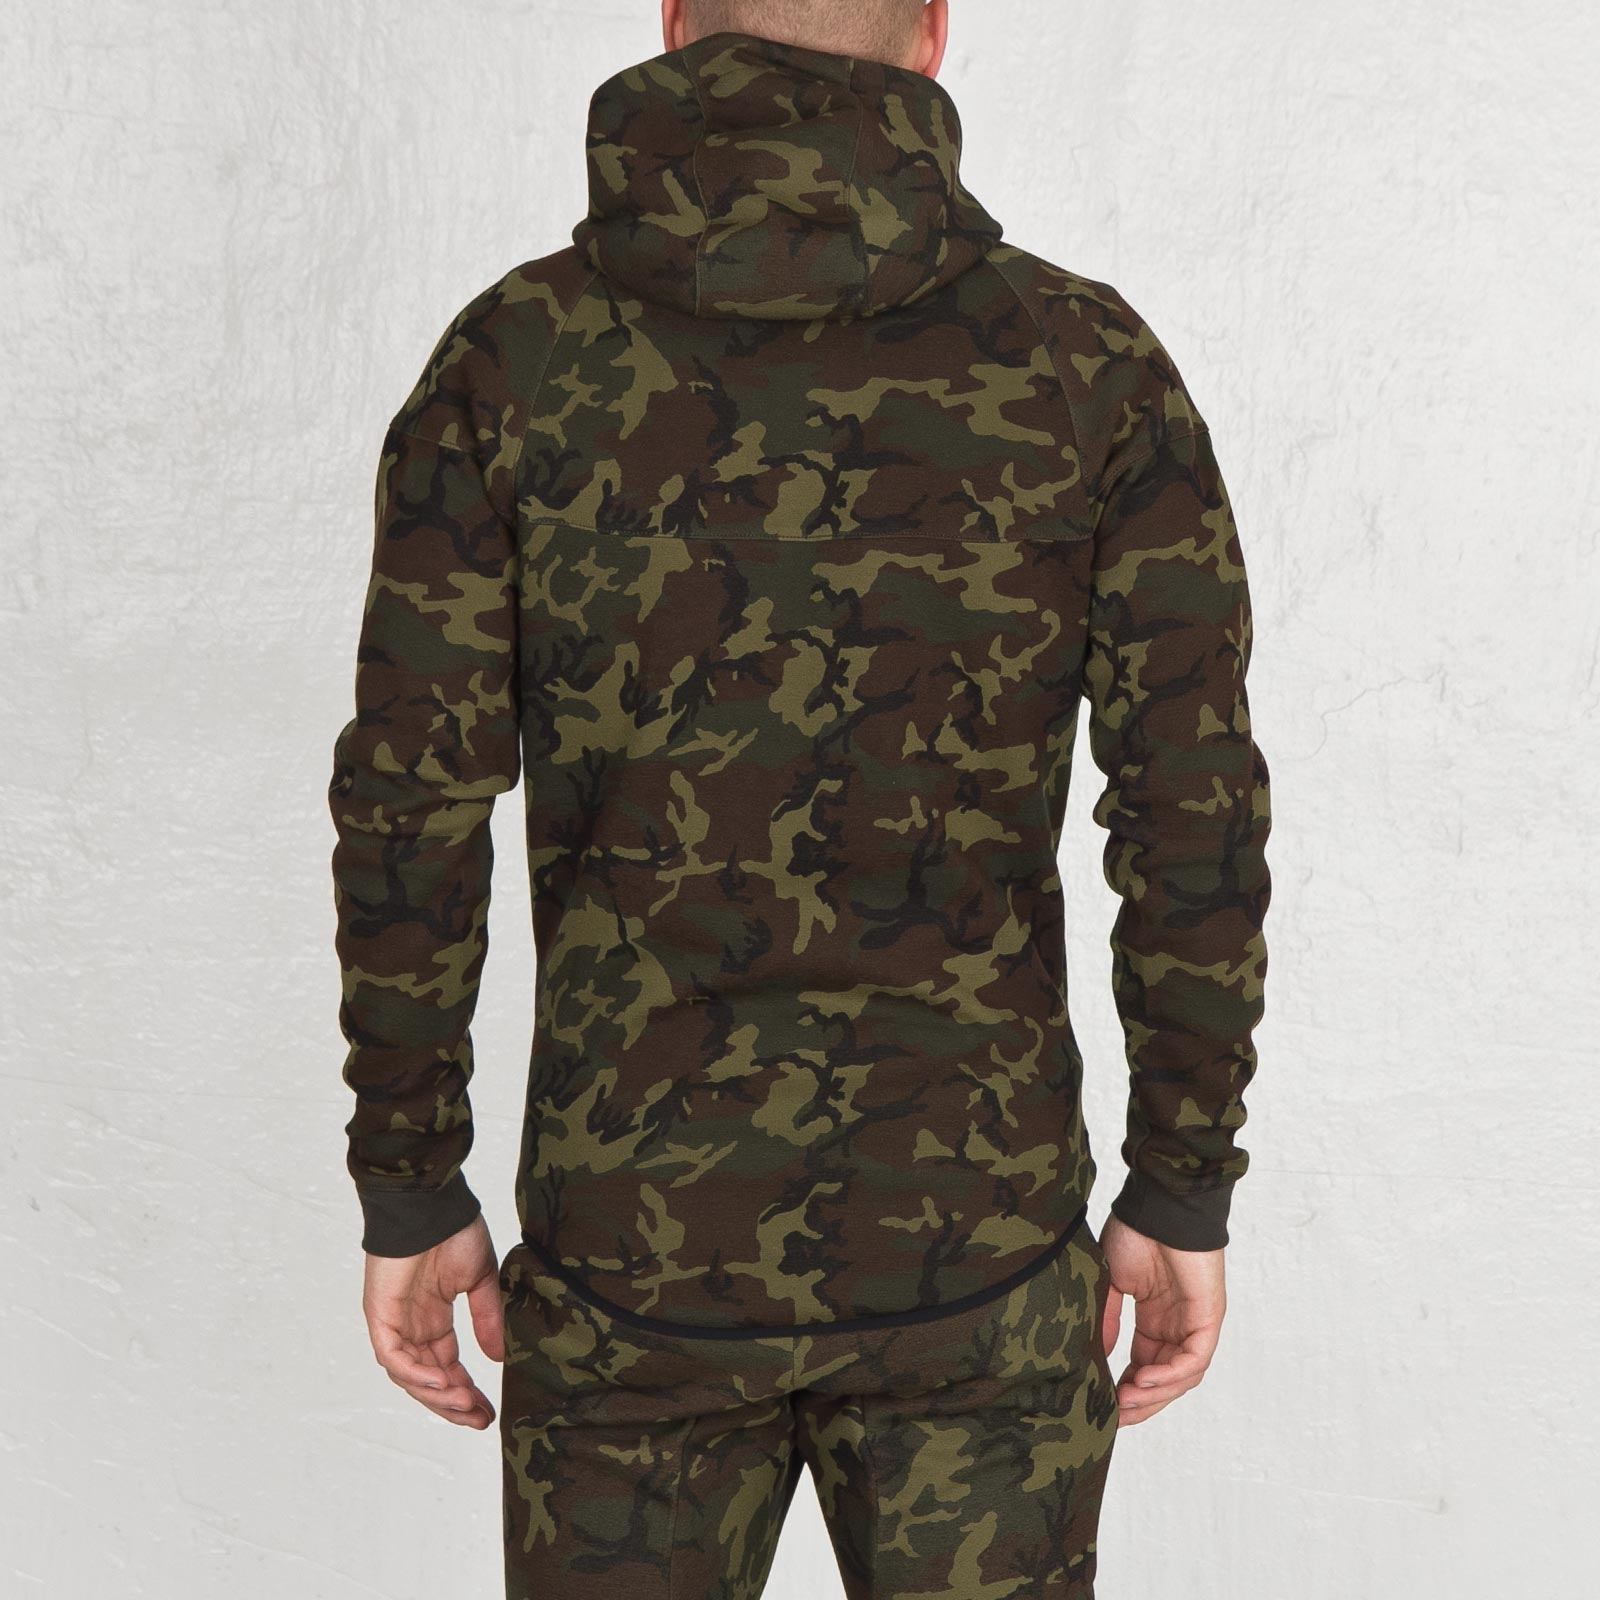 ce3fd366d0 Nike Tech Fleece Windrunner - Camo - 694004-355 - Sneakersnstuff ...